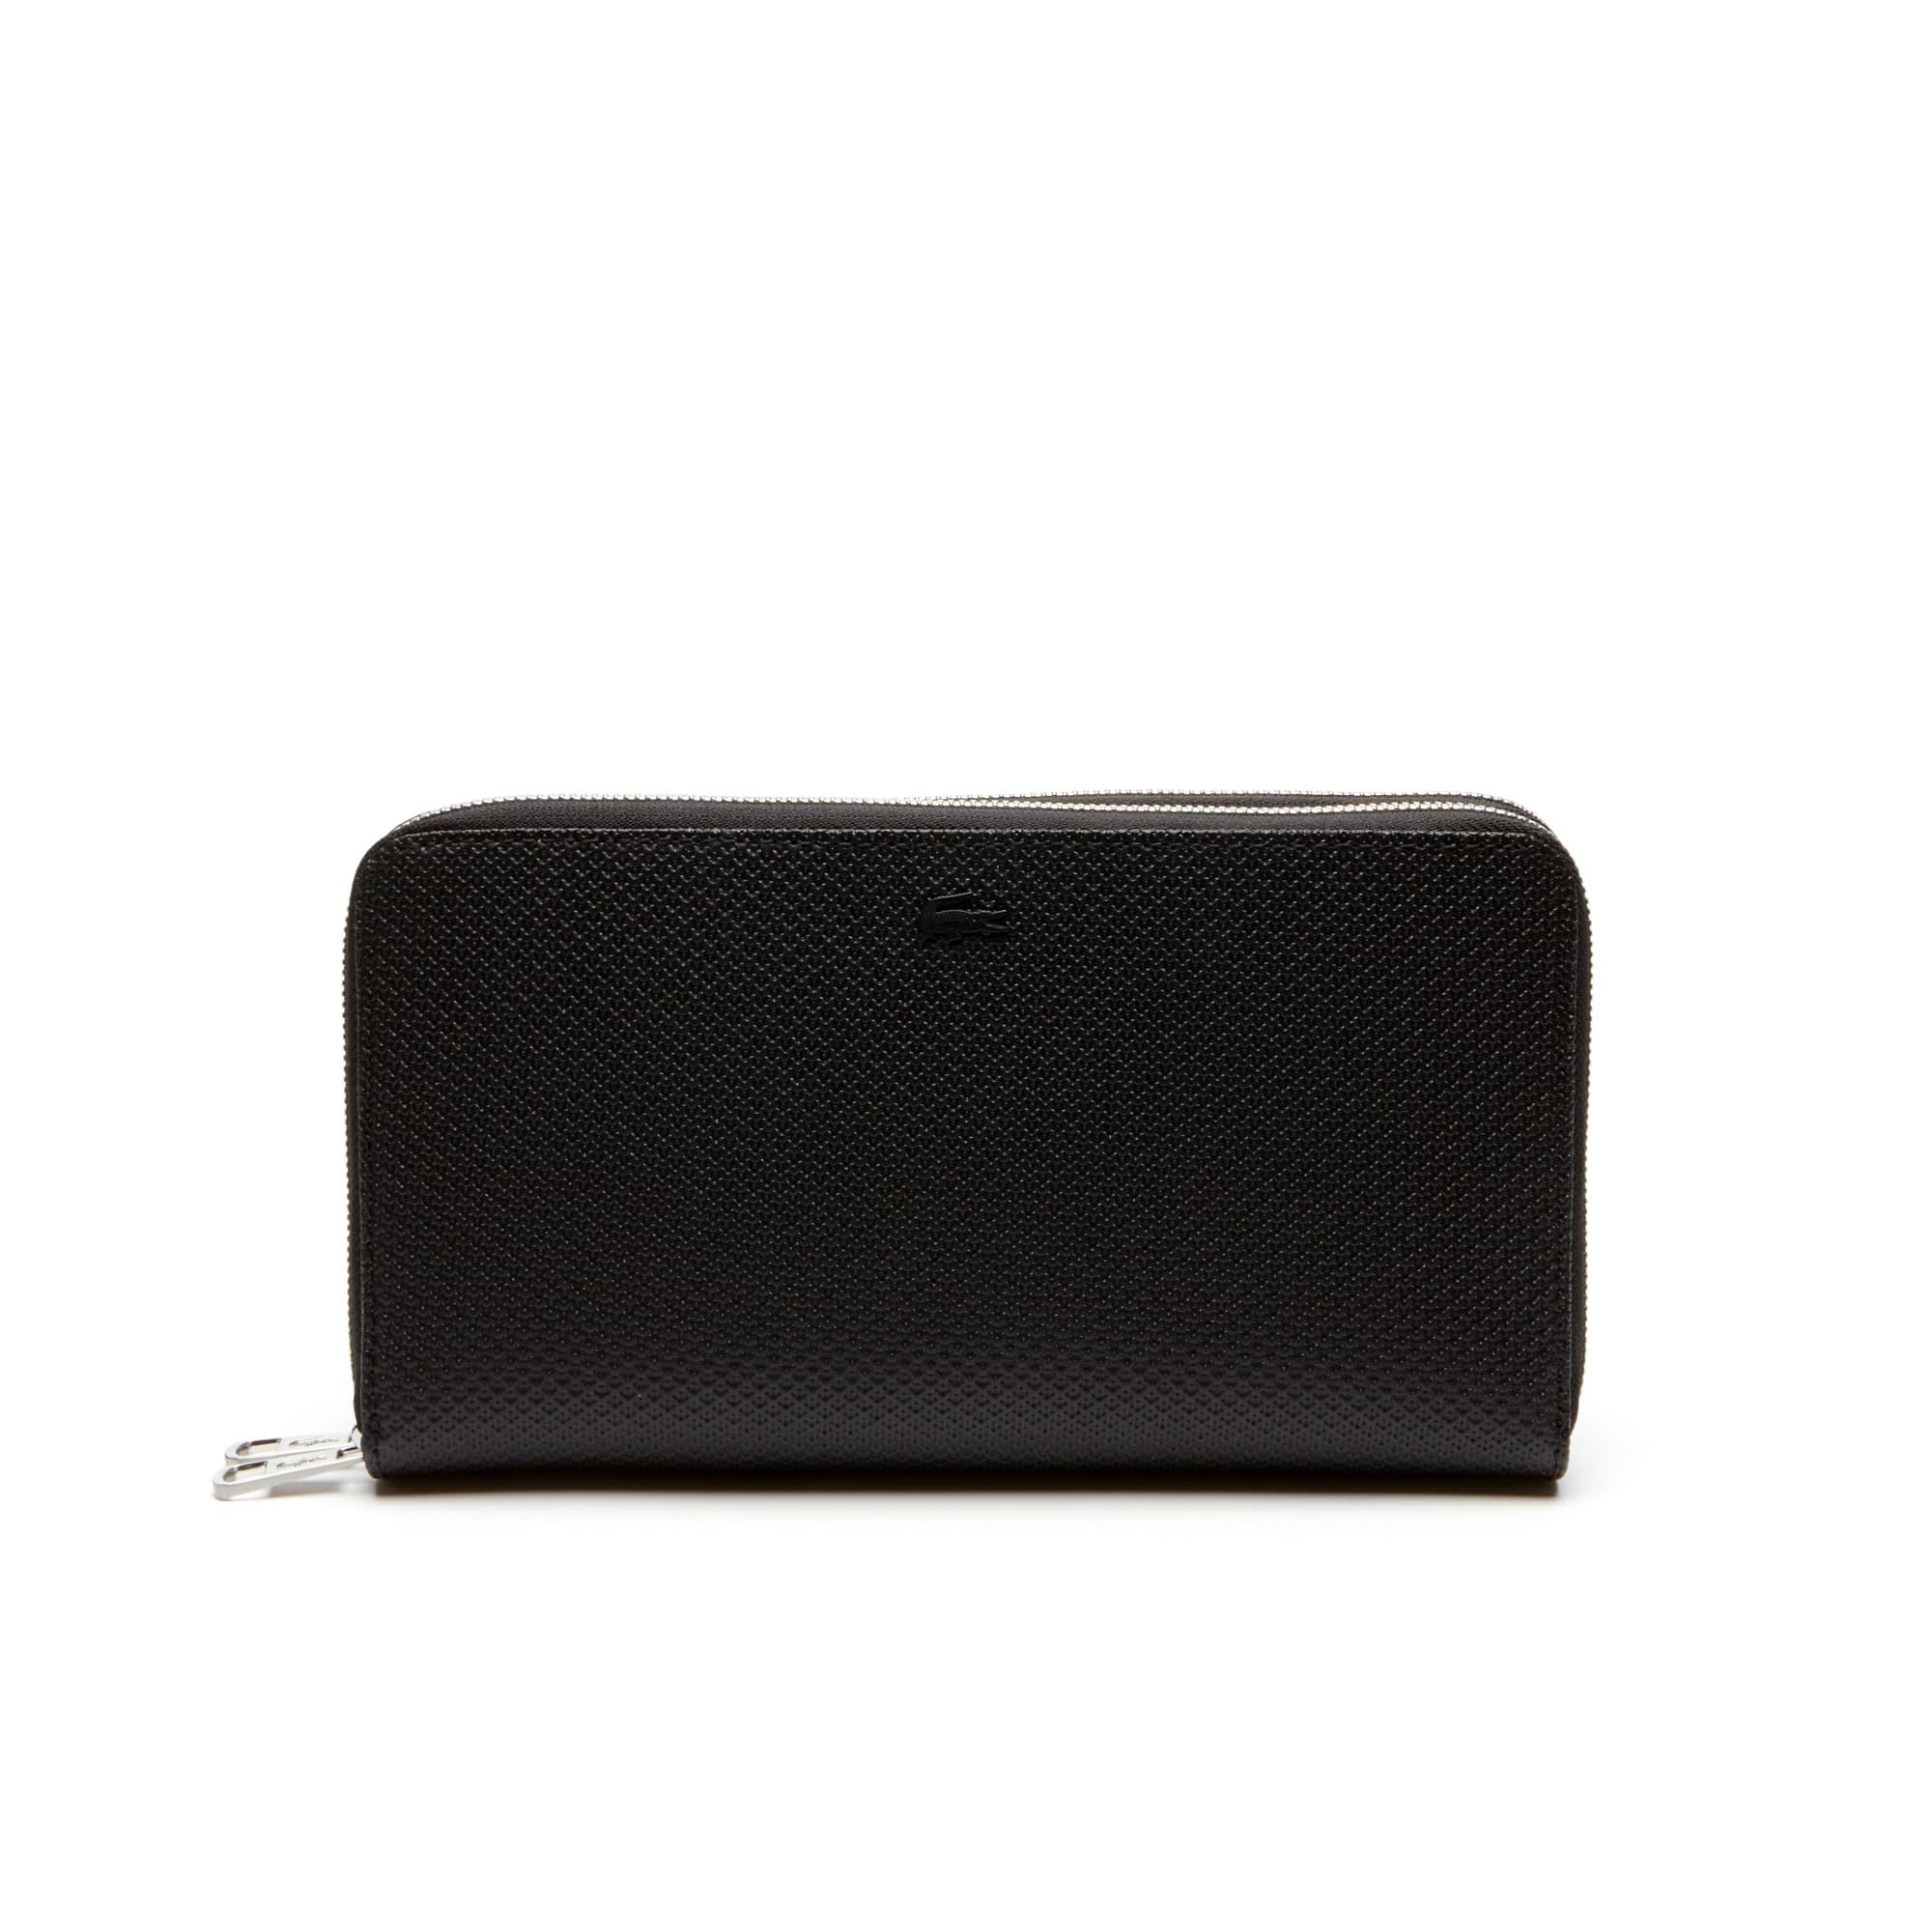 Men's Zippered Matte Leather Wallet